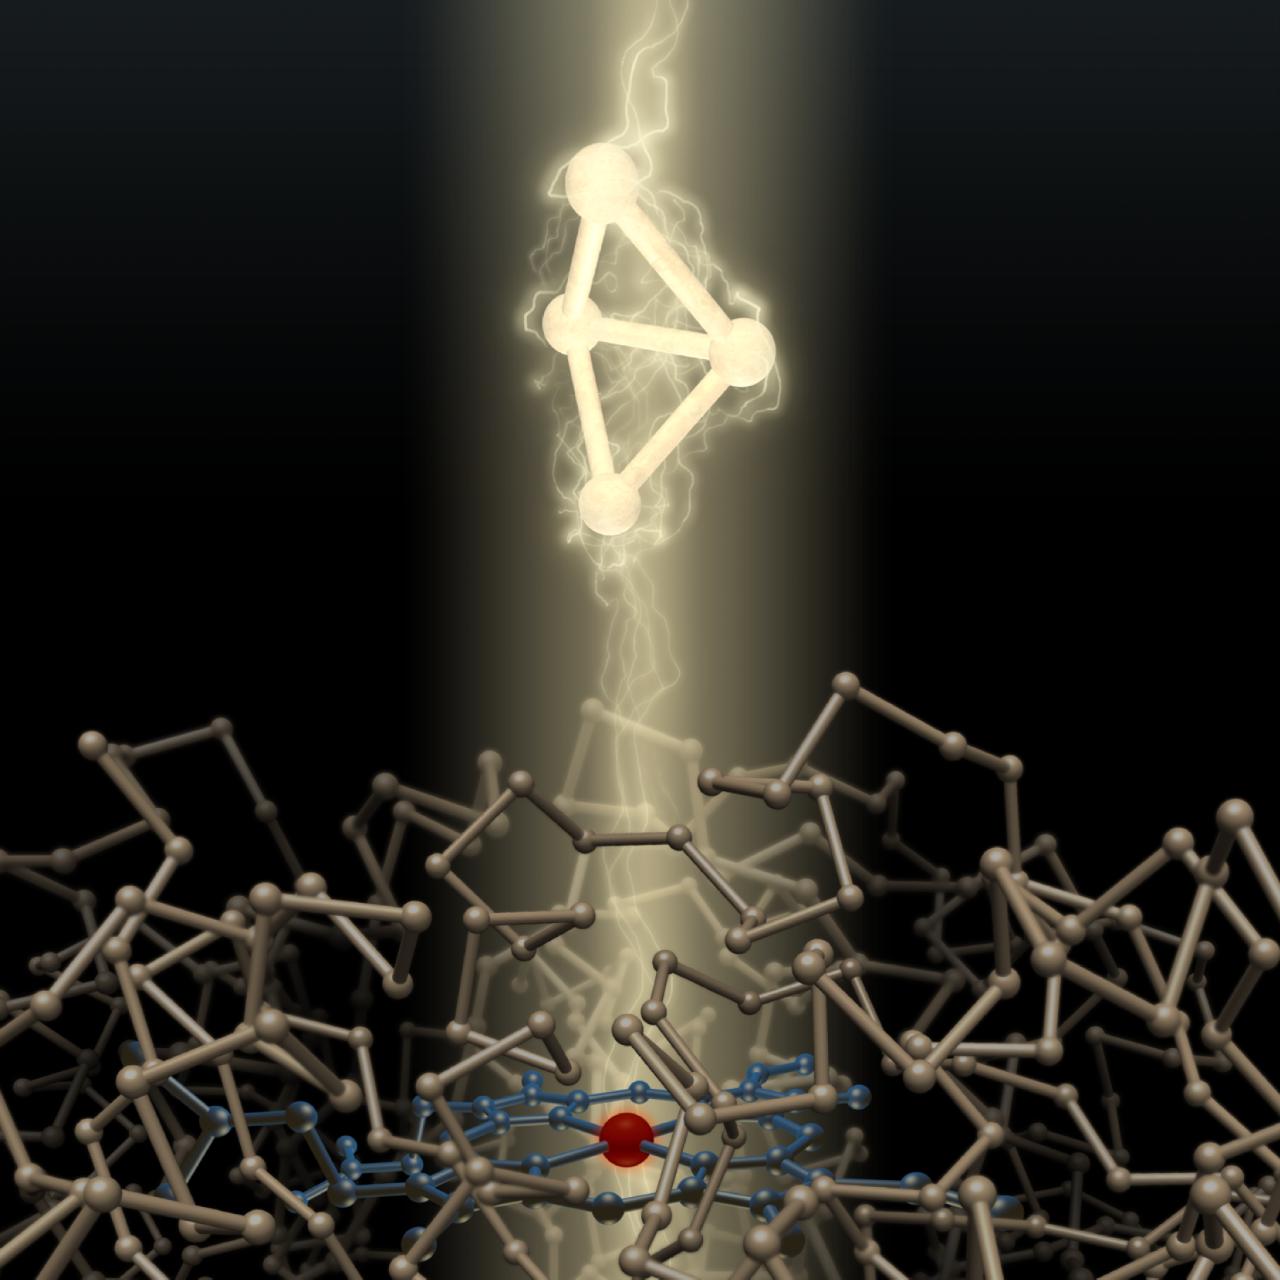 Biomolecular_Engineering_Arnold_21_07_26.png